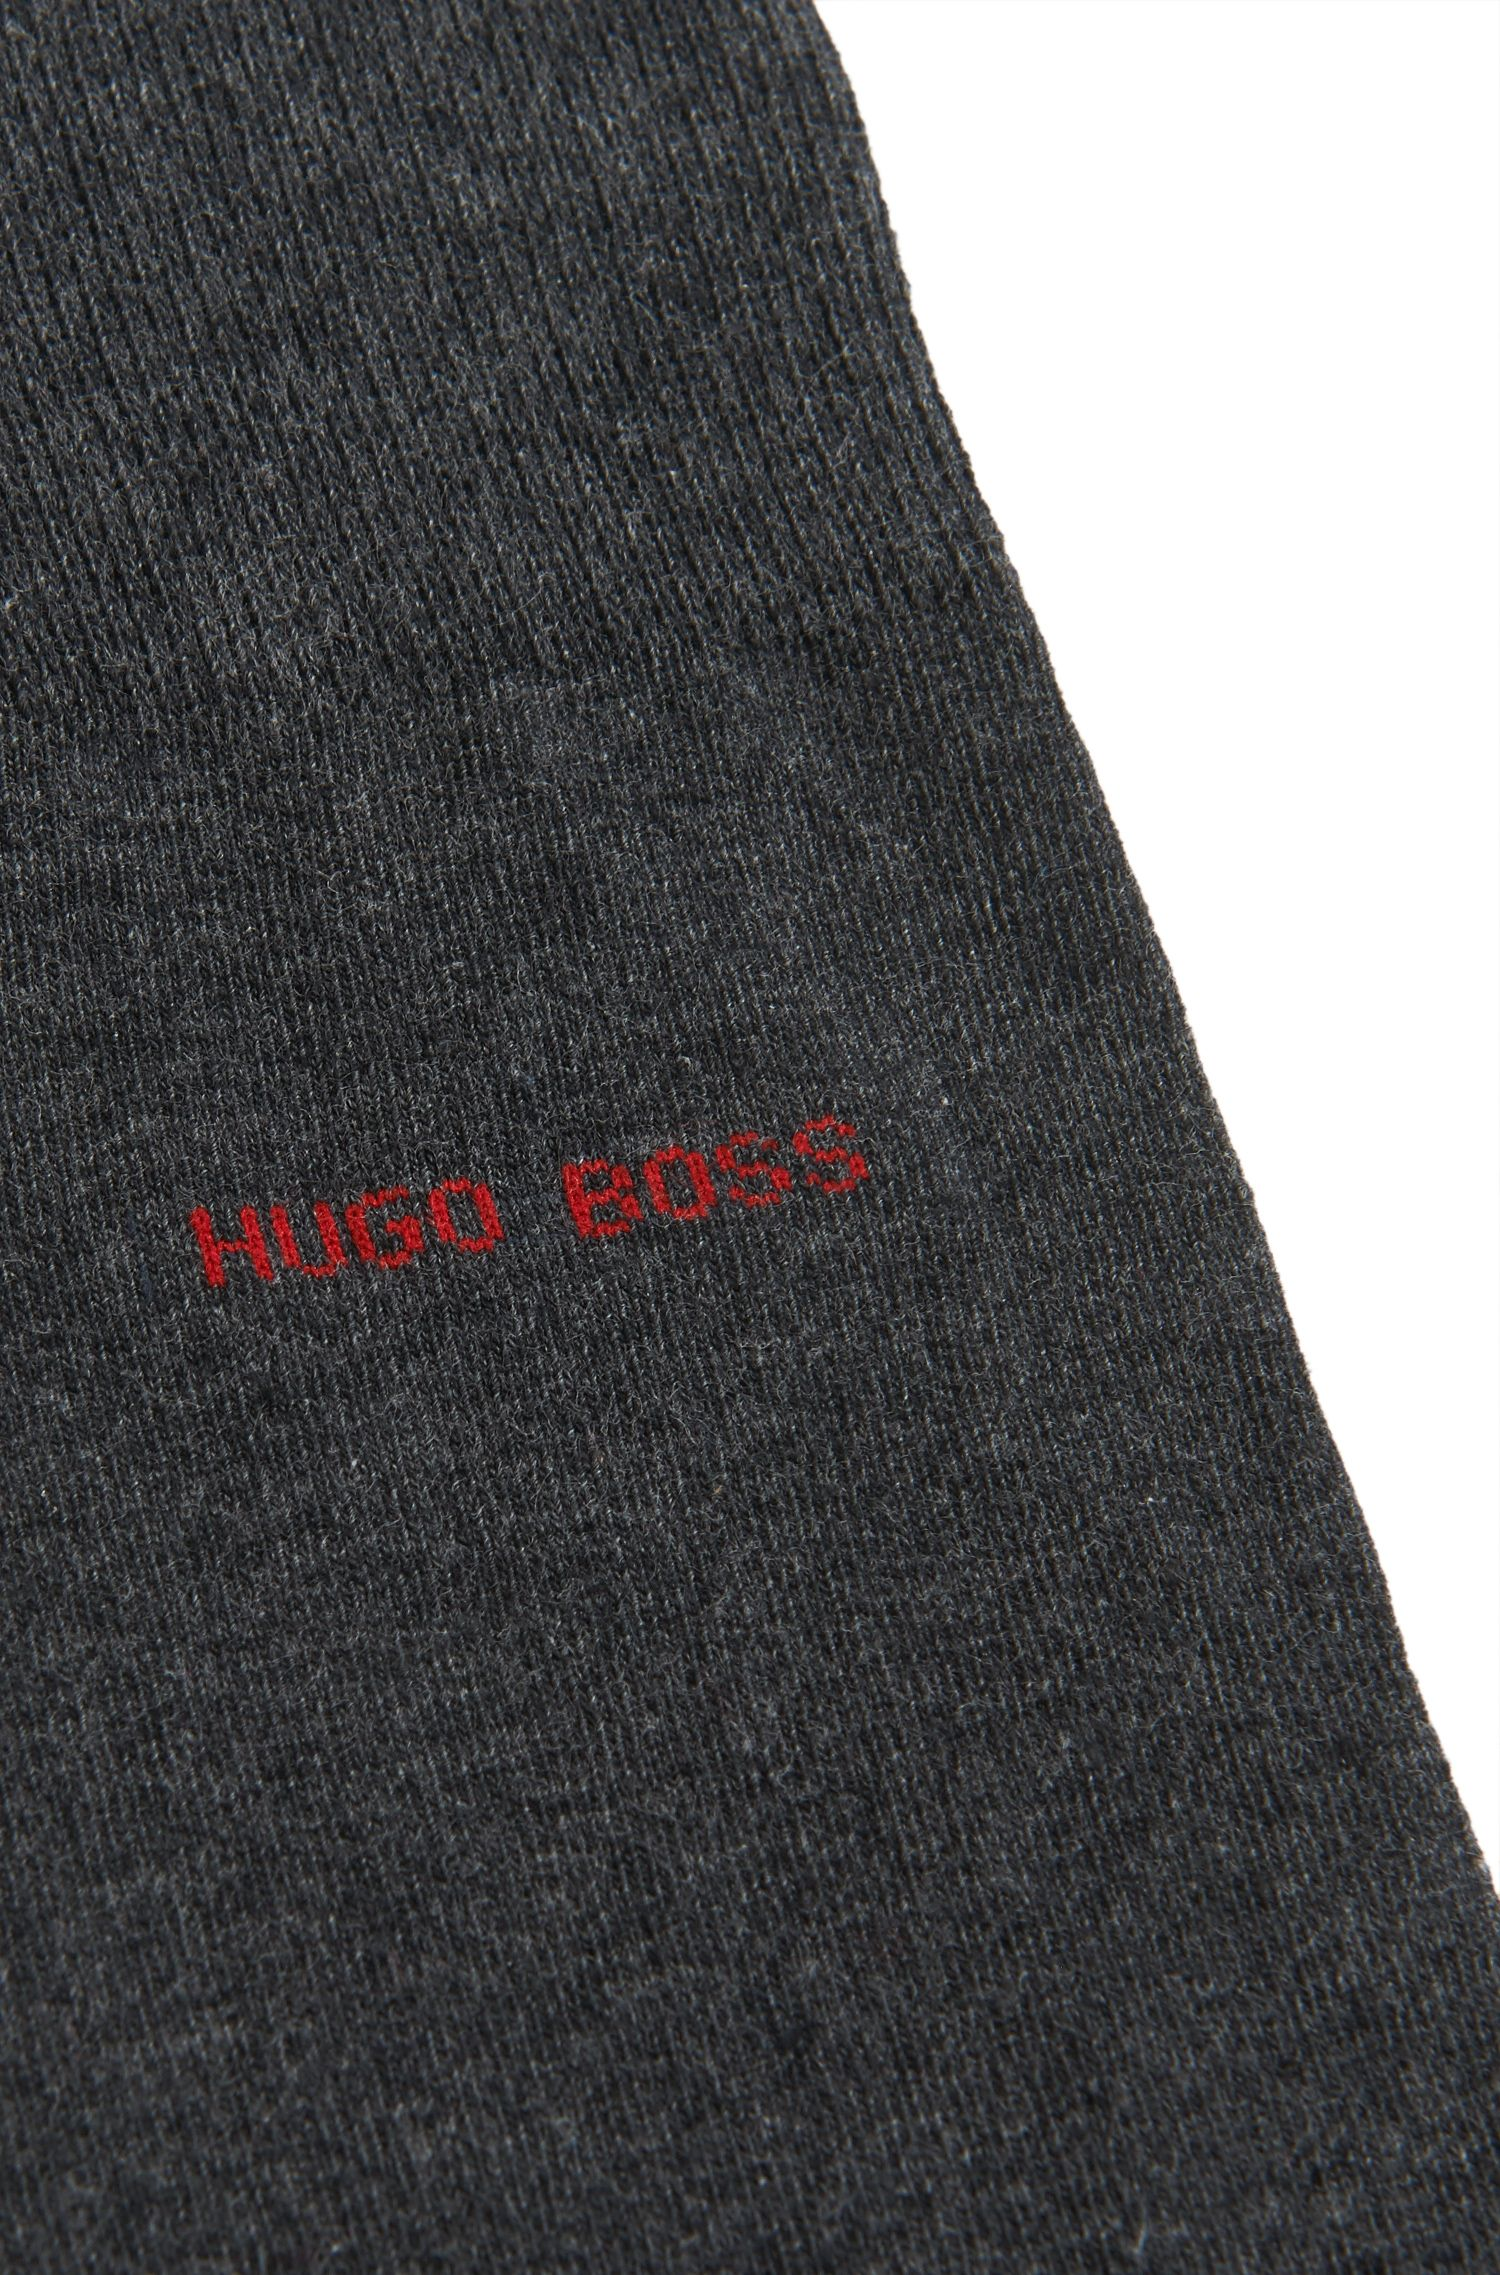 Contrast Socks  Marc RS Heel & Toe US, Charcoal